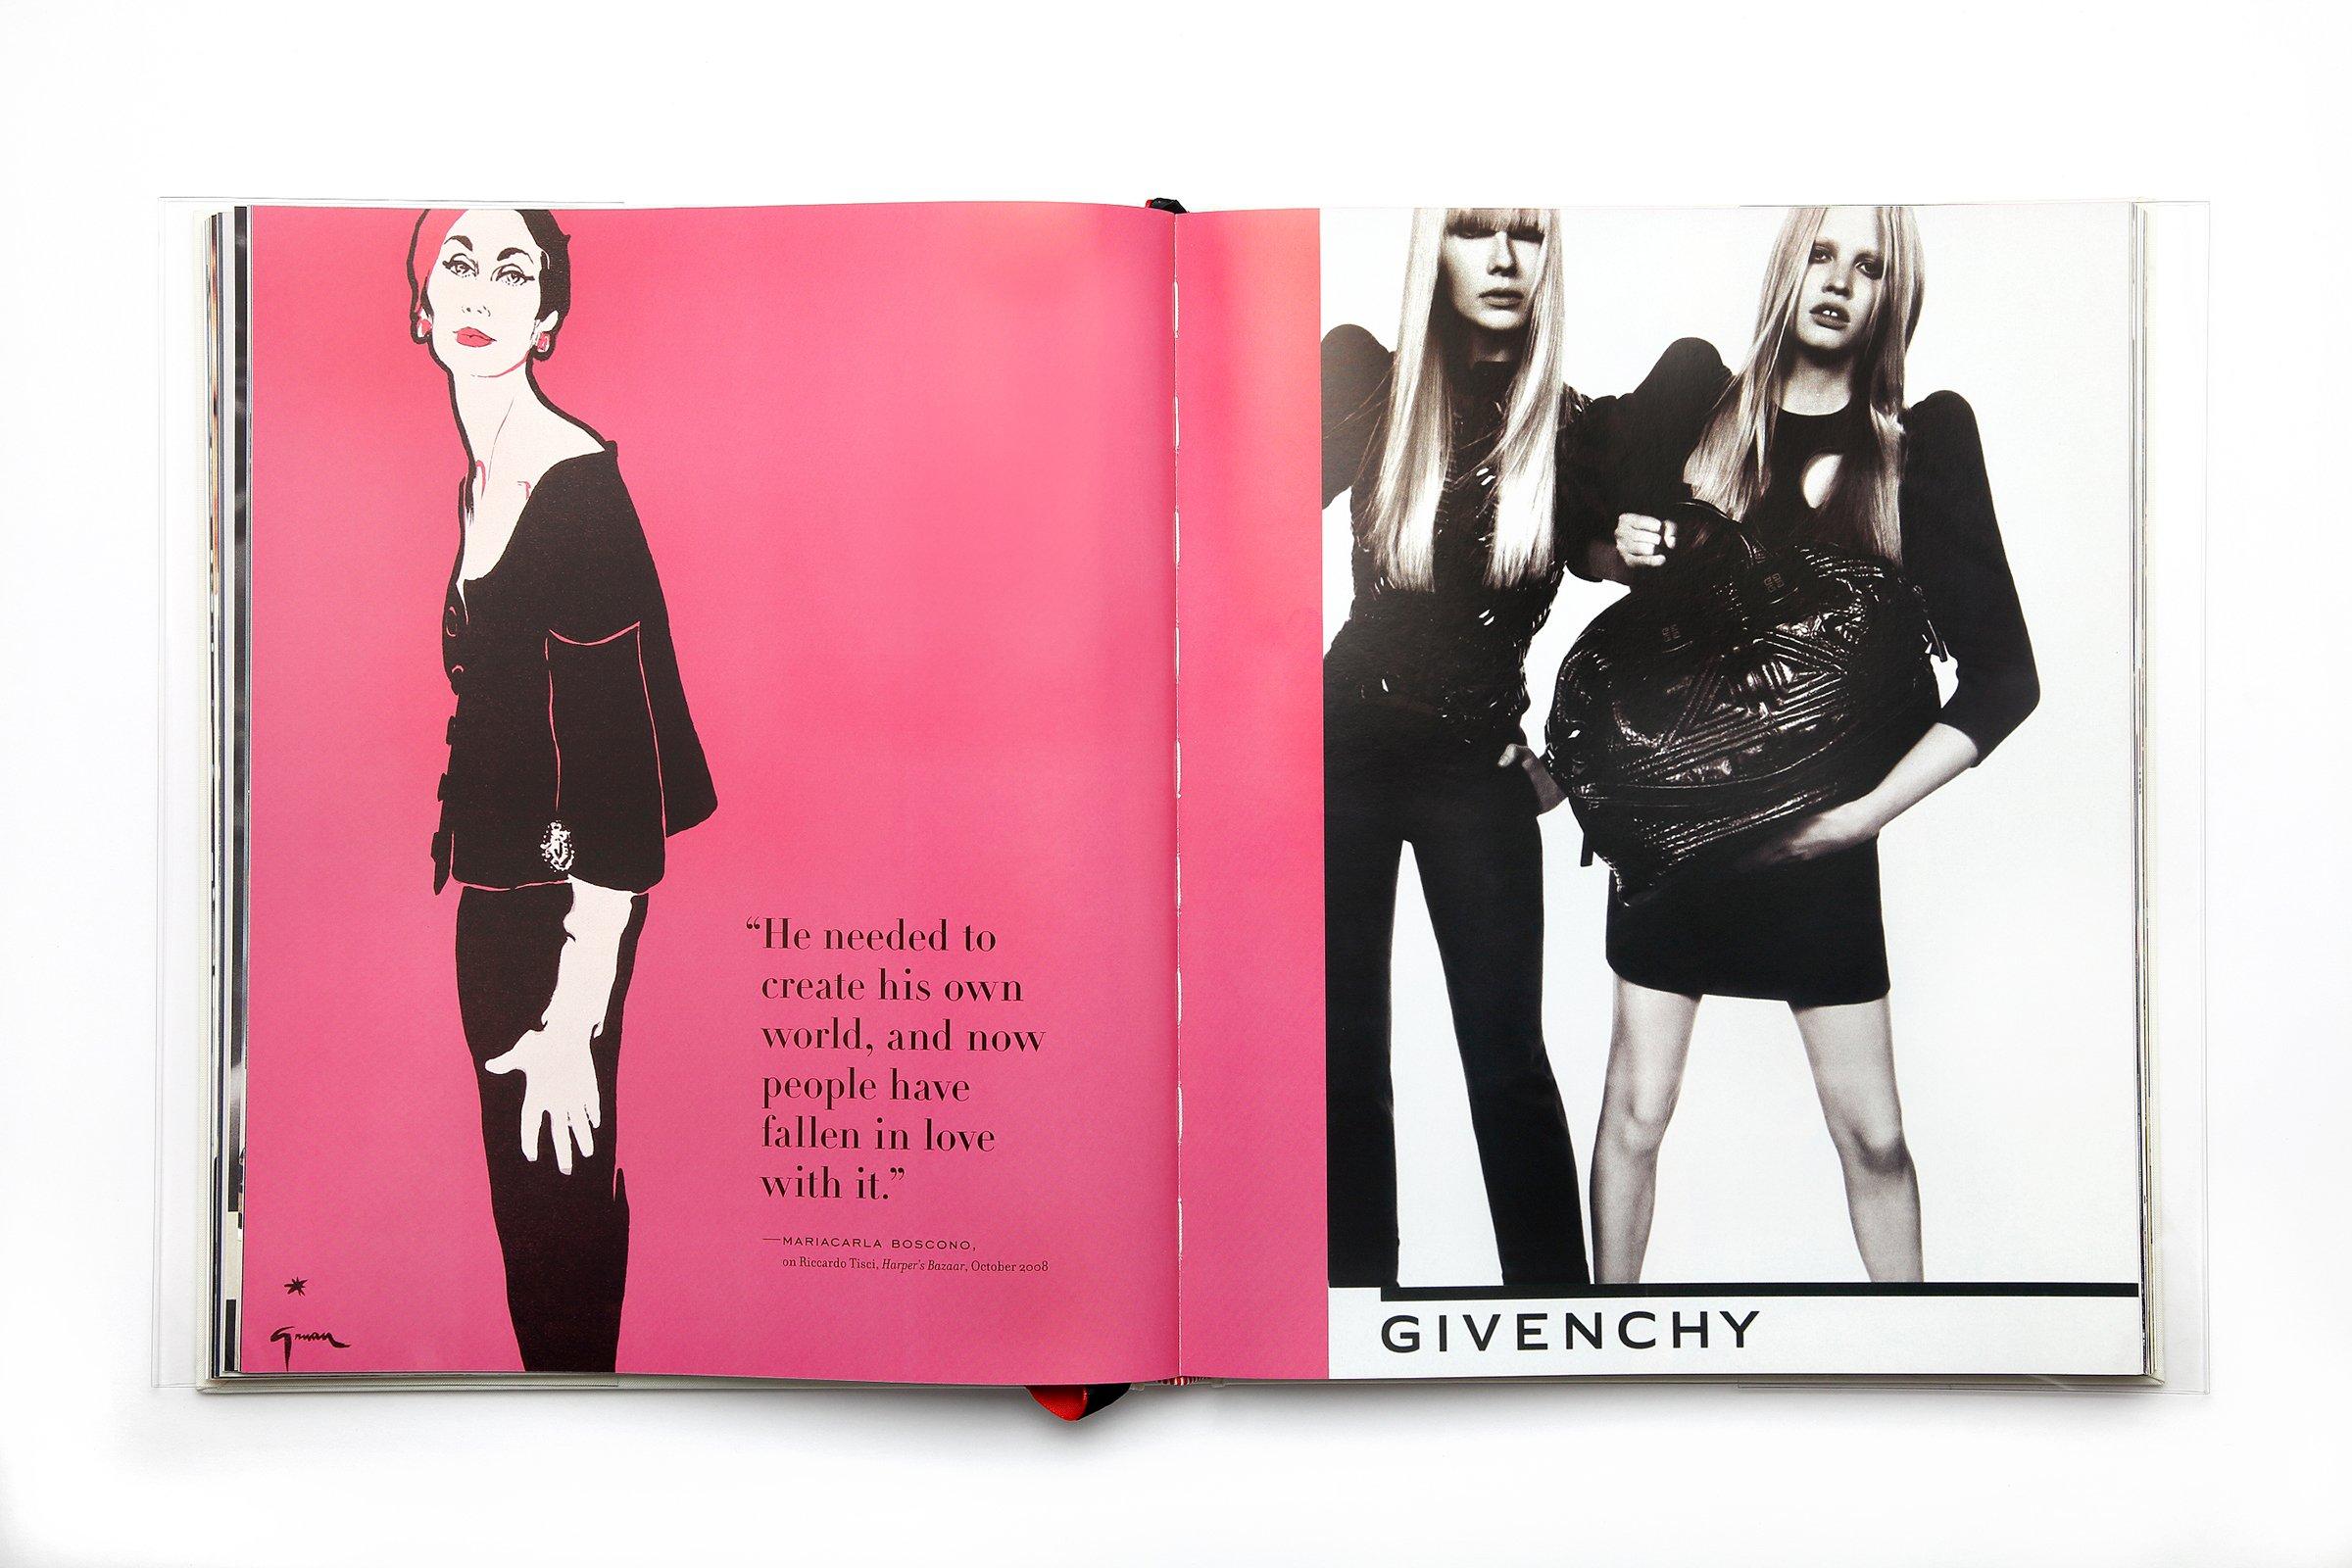 7fe3ec891cd6 Handbags  A Love Story  Legendary Designs from Azzedine Alaïa to Yves Saint  Laurent  Monica Botkier  9780062428356  Amazon.com  Books